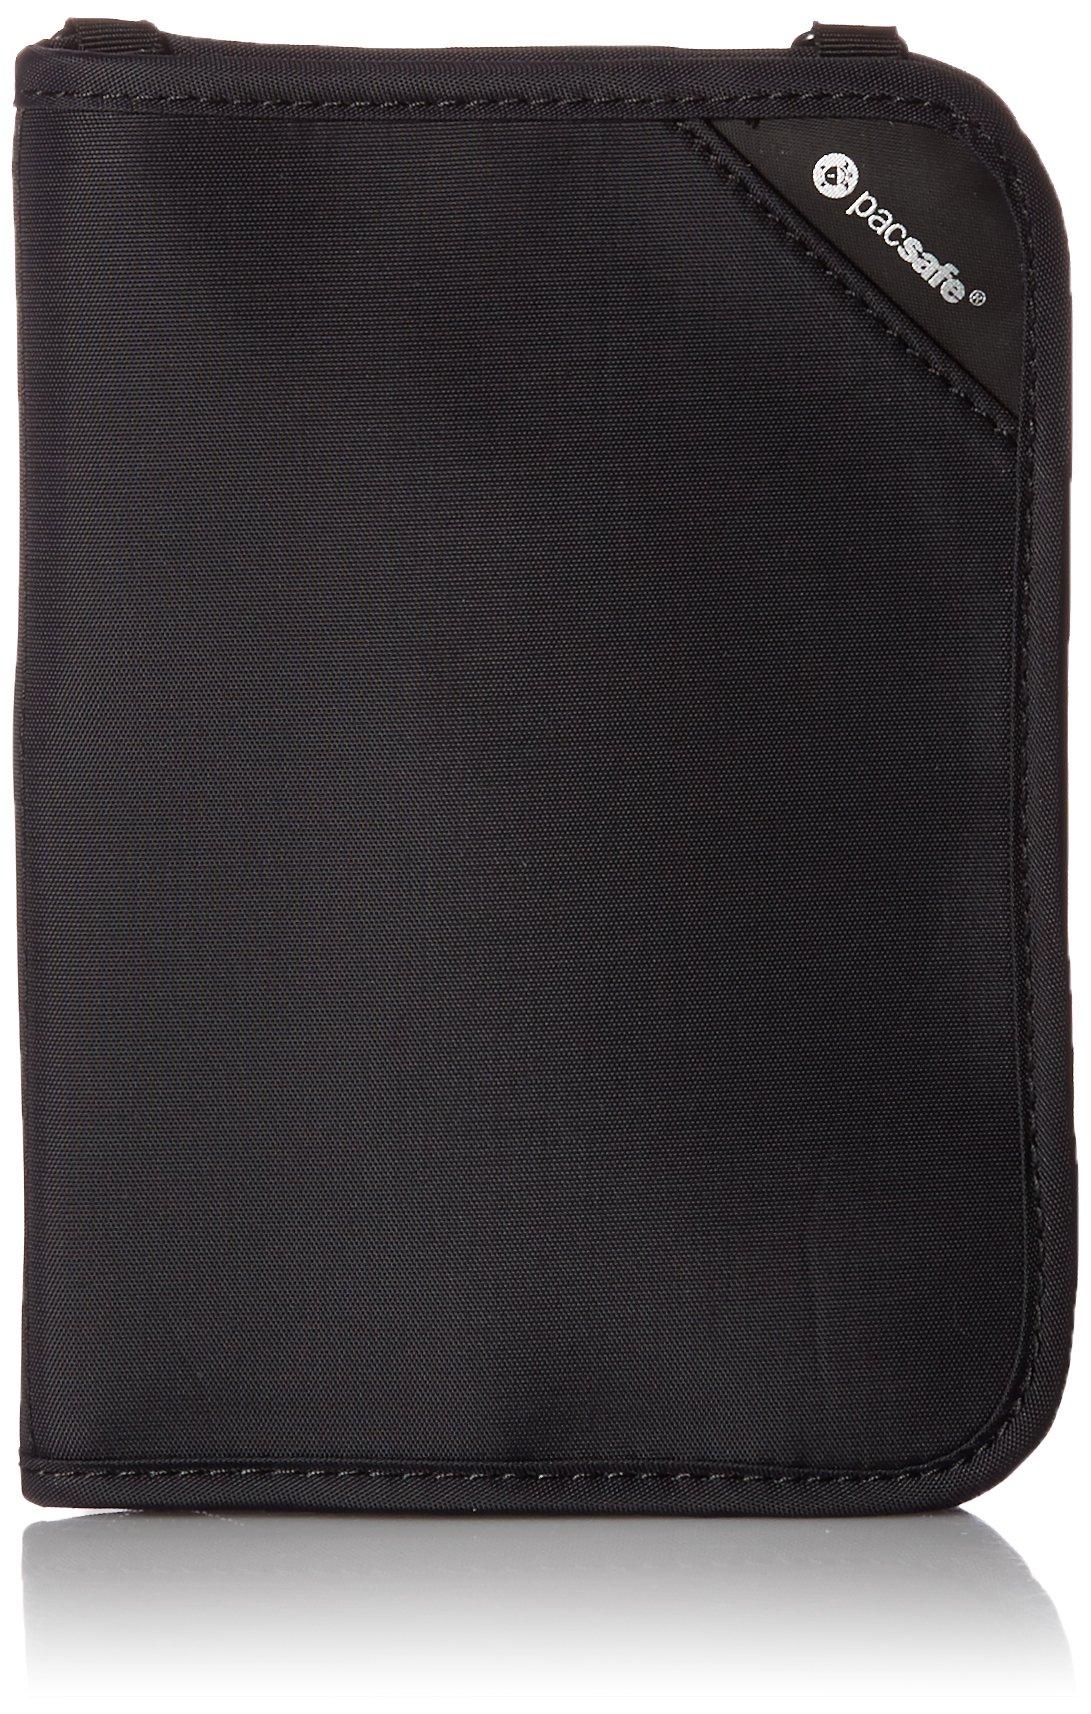 Pacsafe RFIDsafeニュートラルRFIDsafe V150シールド財布10561100ブラックワンサイズ